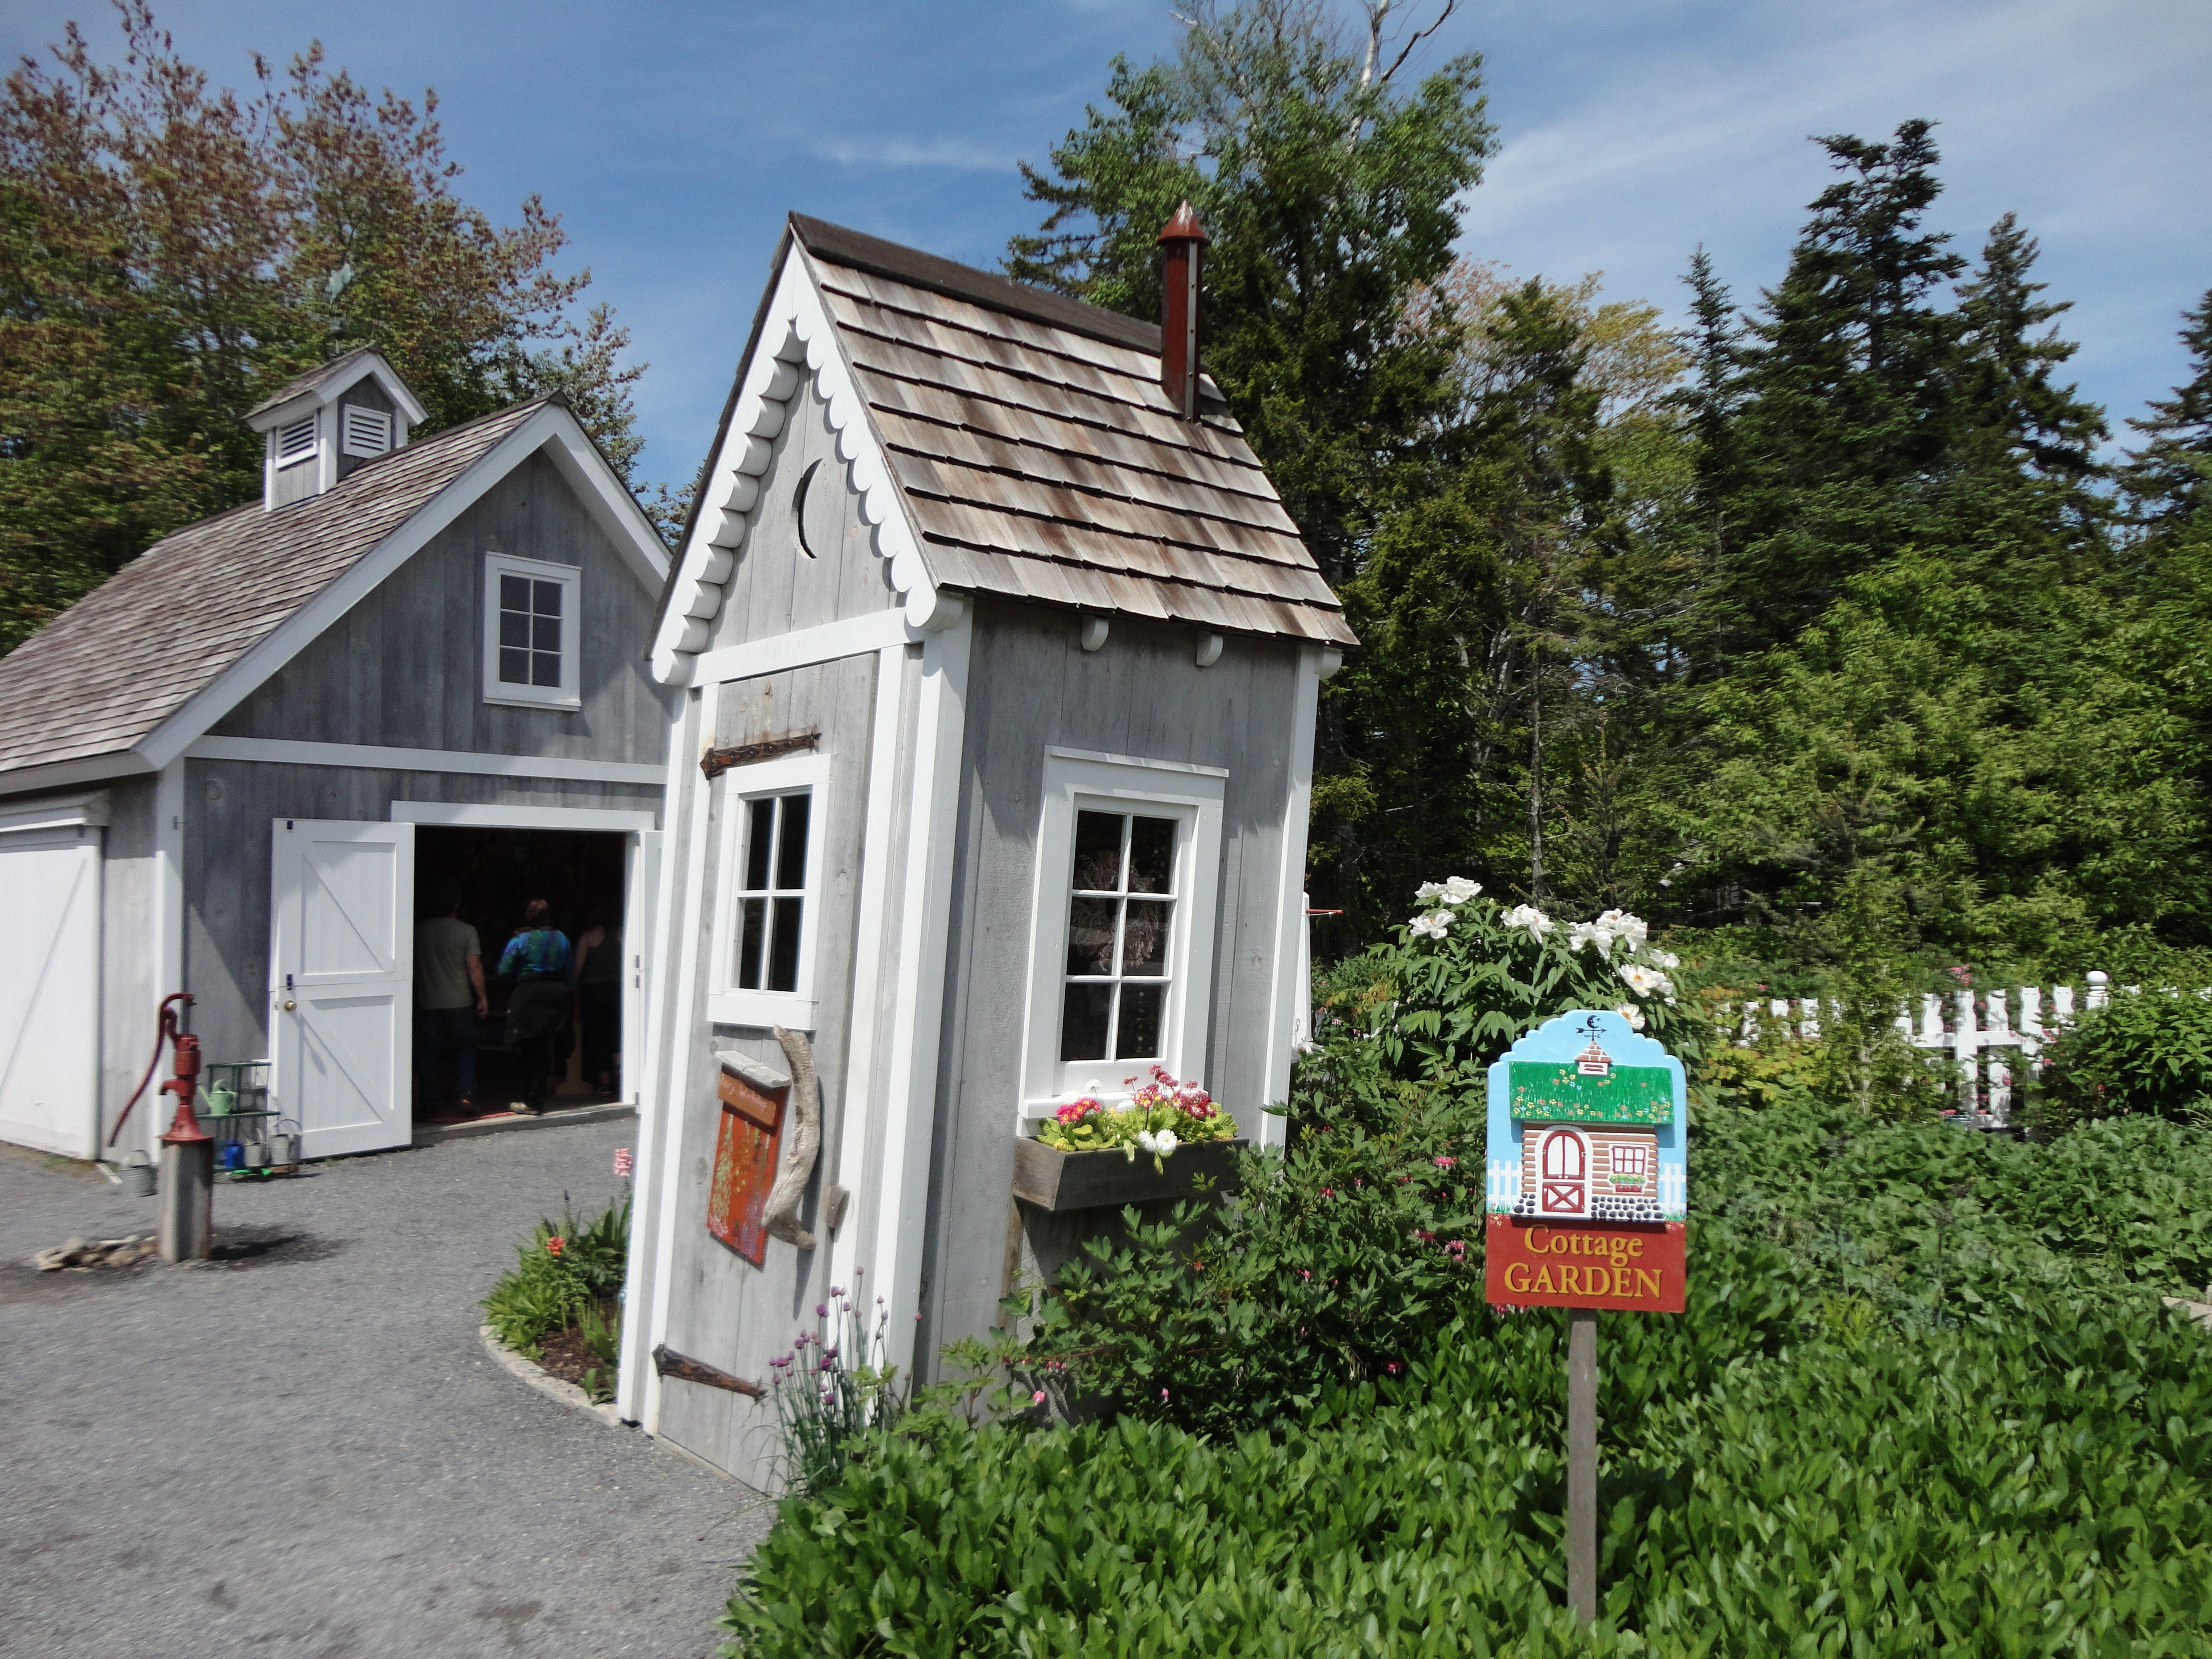 Cute little fairy house for kids.